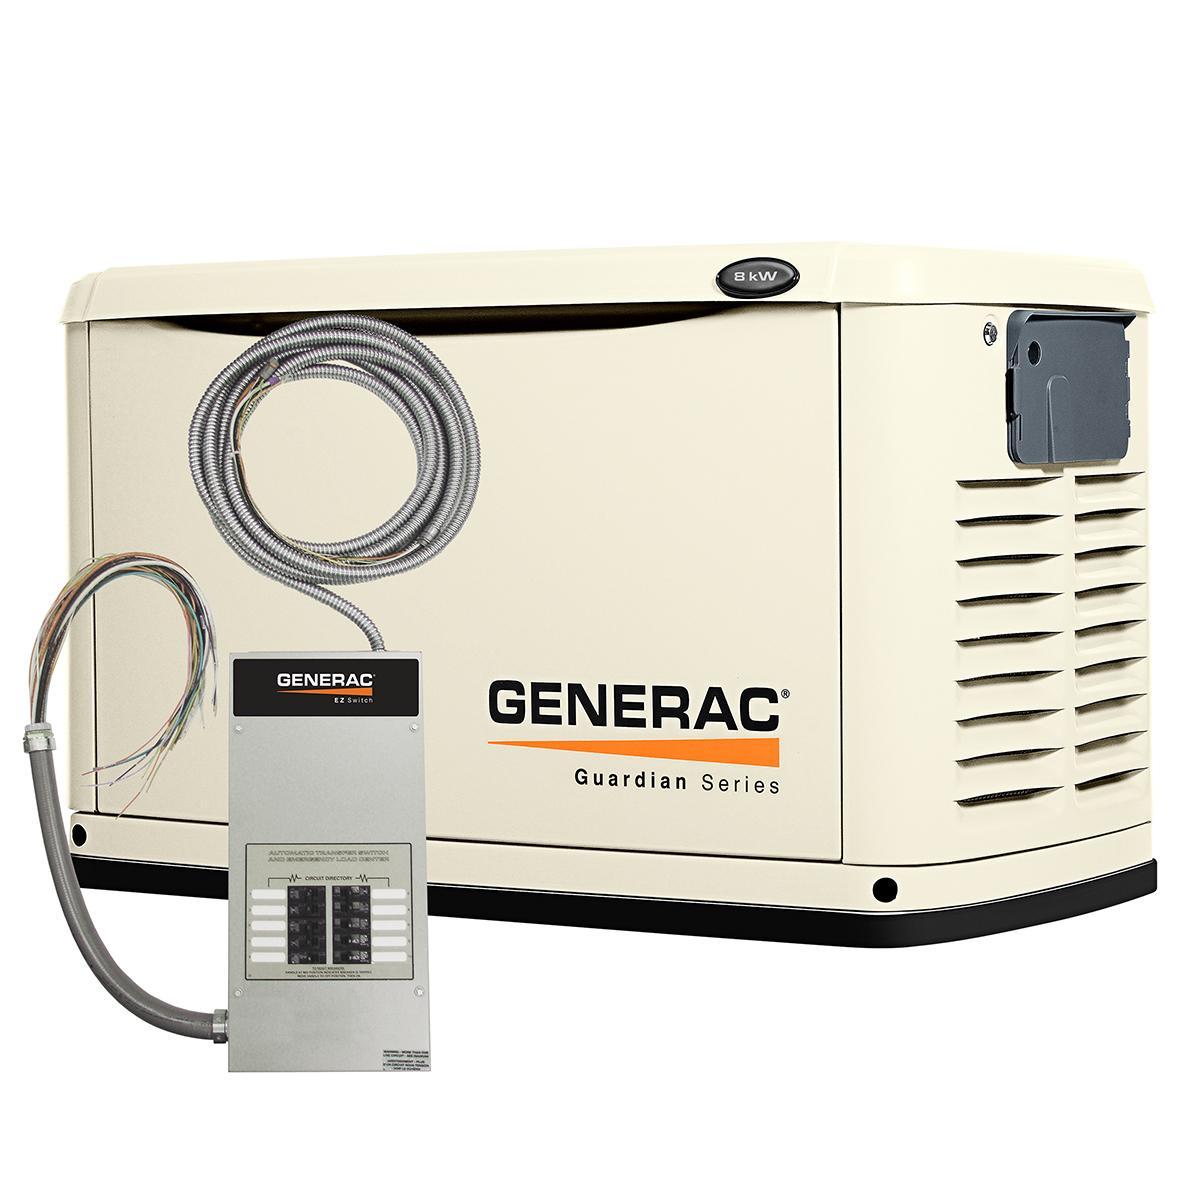 Ym 5703 Standby Generator Wiring Diagram On Generac 8kw Wiring Diagram Schematic Wiring